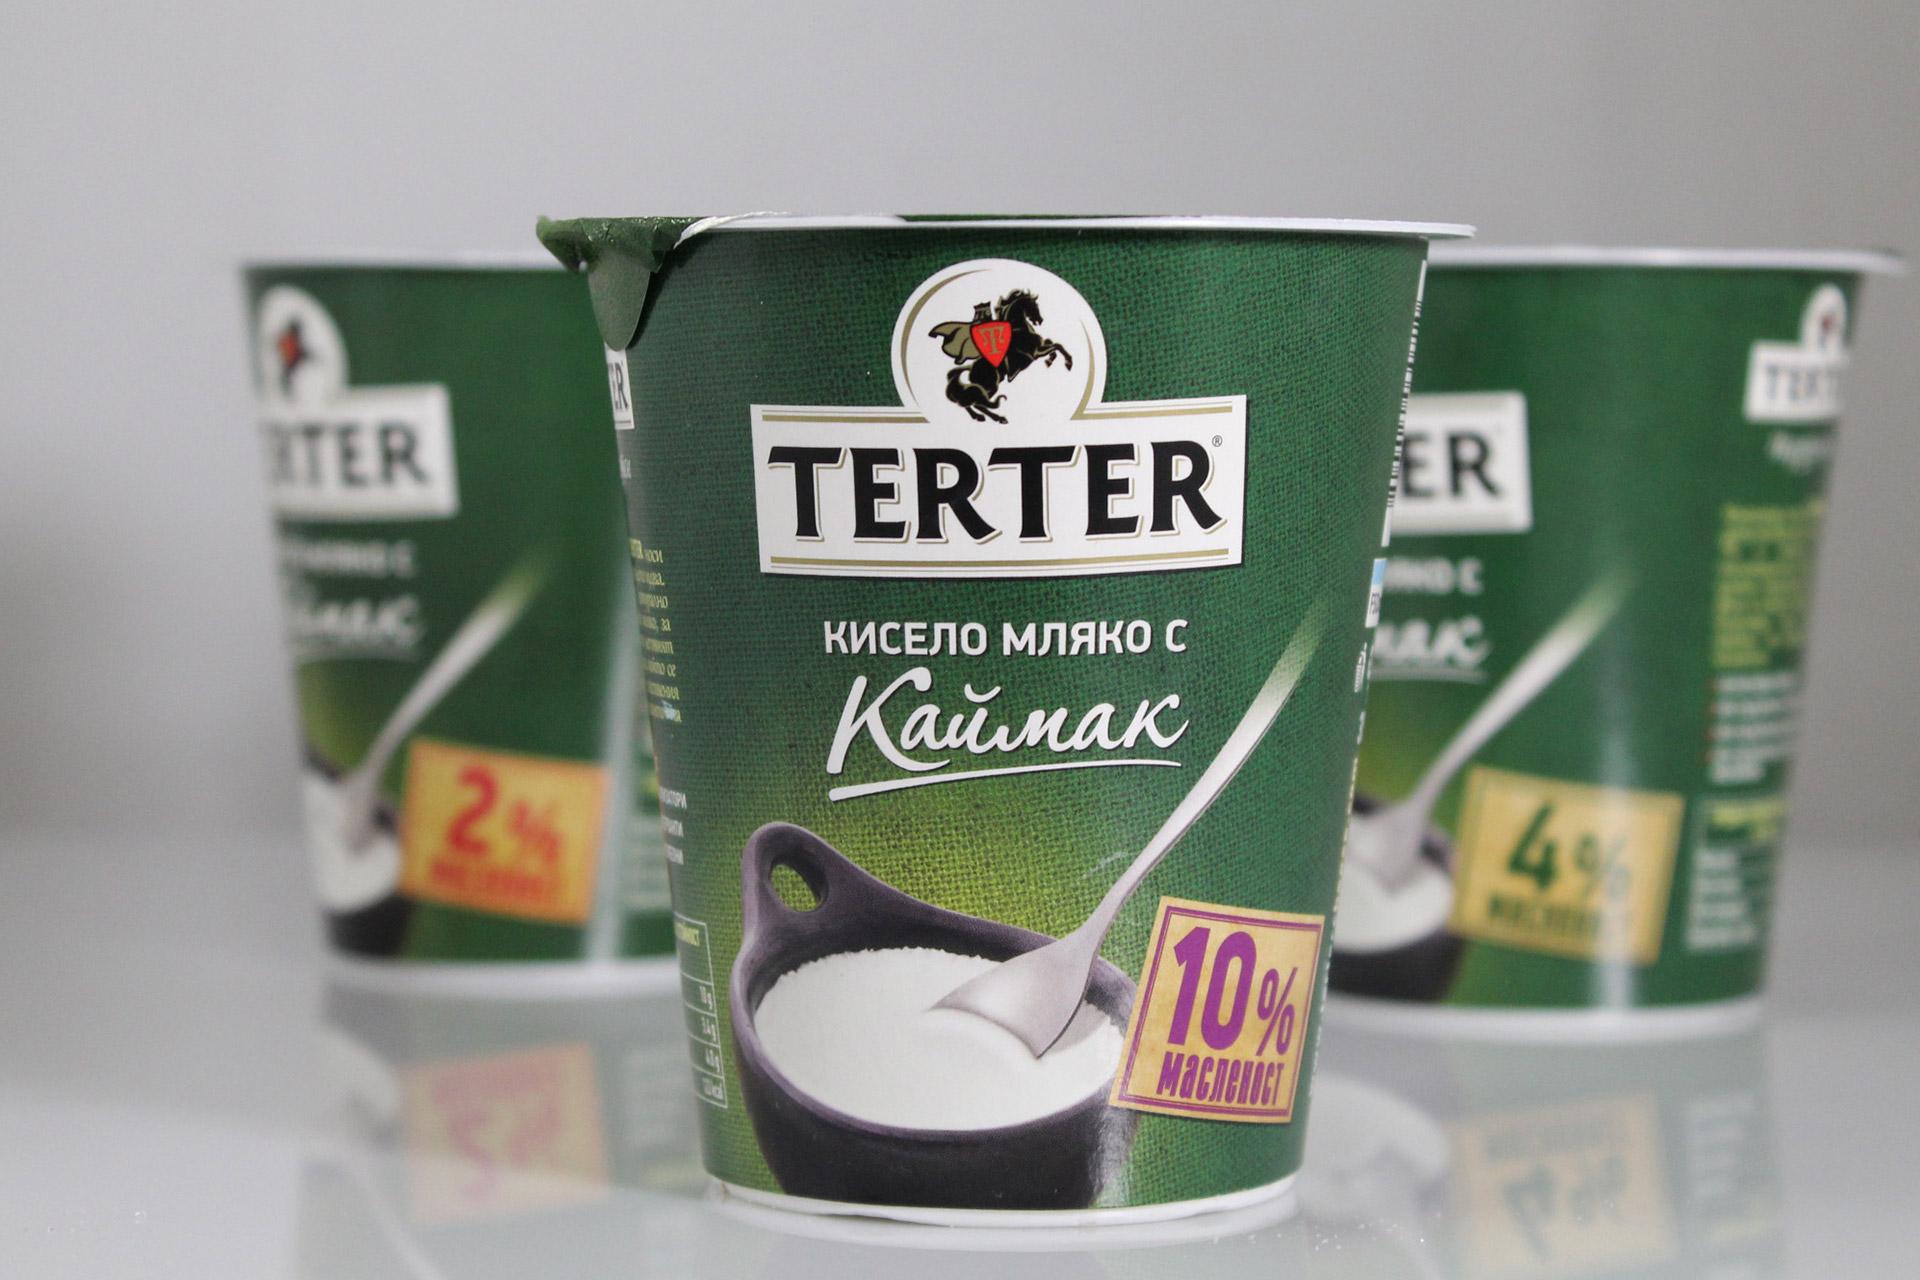 milen galabov packaging design terter yogurt